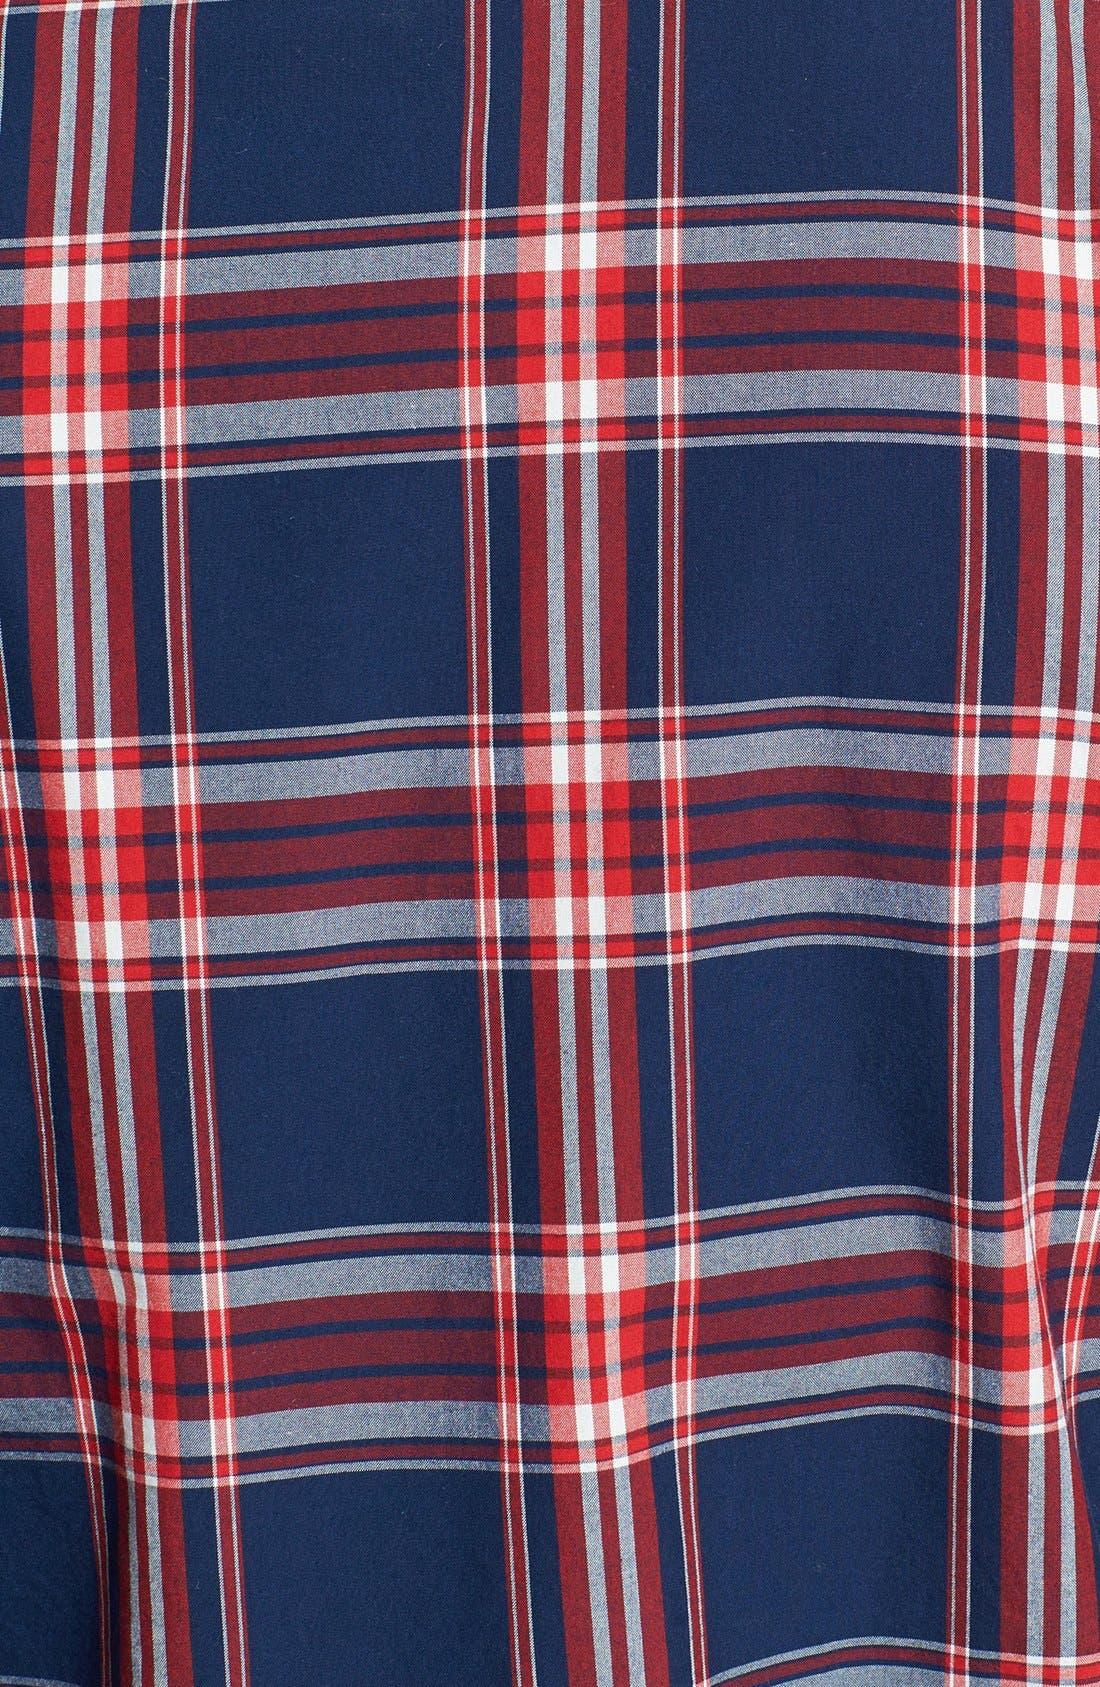 Alternate Image 3  - Bonobos 'Dalton' Standard Fit Plaid Shirt